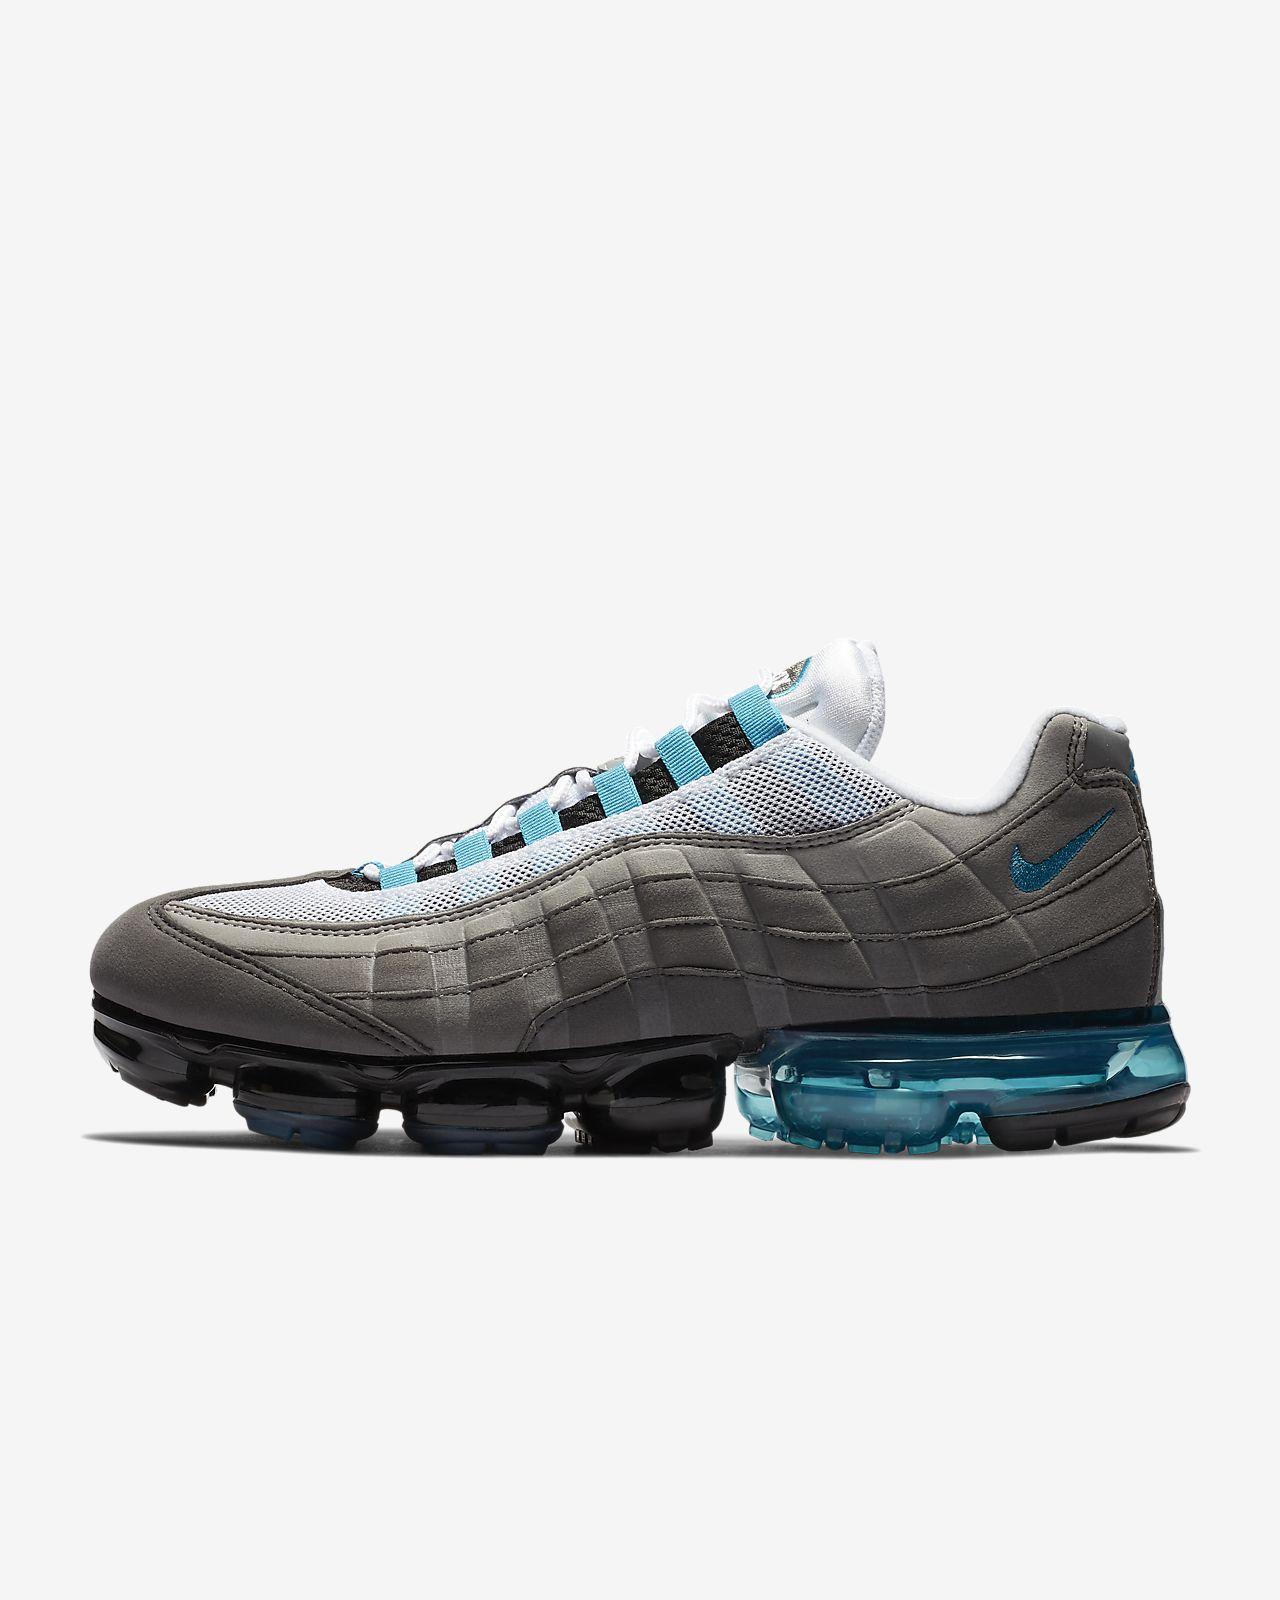 reputable site d82d0 98f5e ... Chaussure Nike Air VaporMax 95 pour Homme